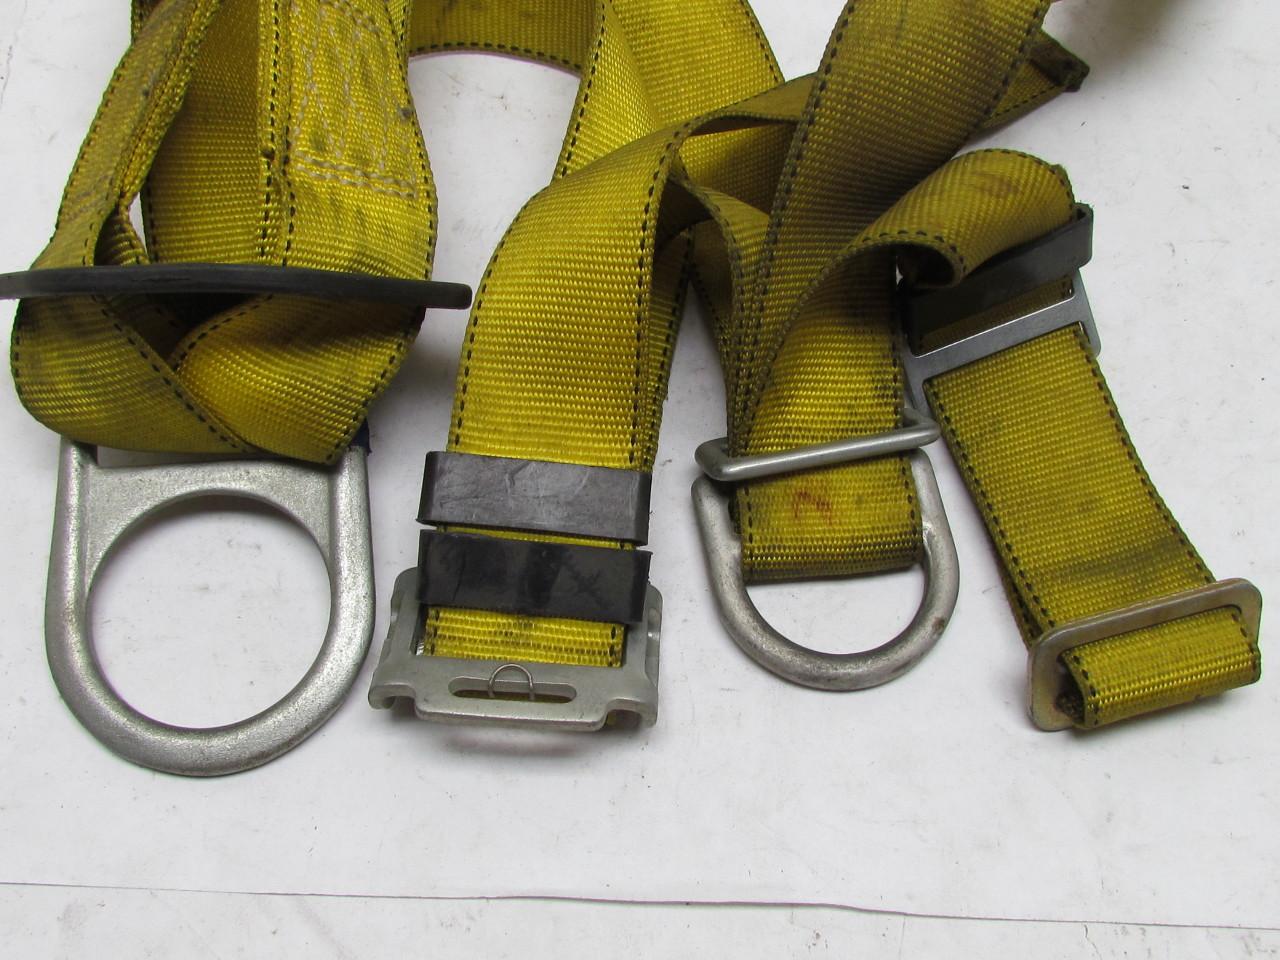 dbi full body safety harness fall arrest climbing gear. Black Bedroom Furniture Sets. Home Design Ideas